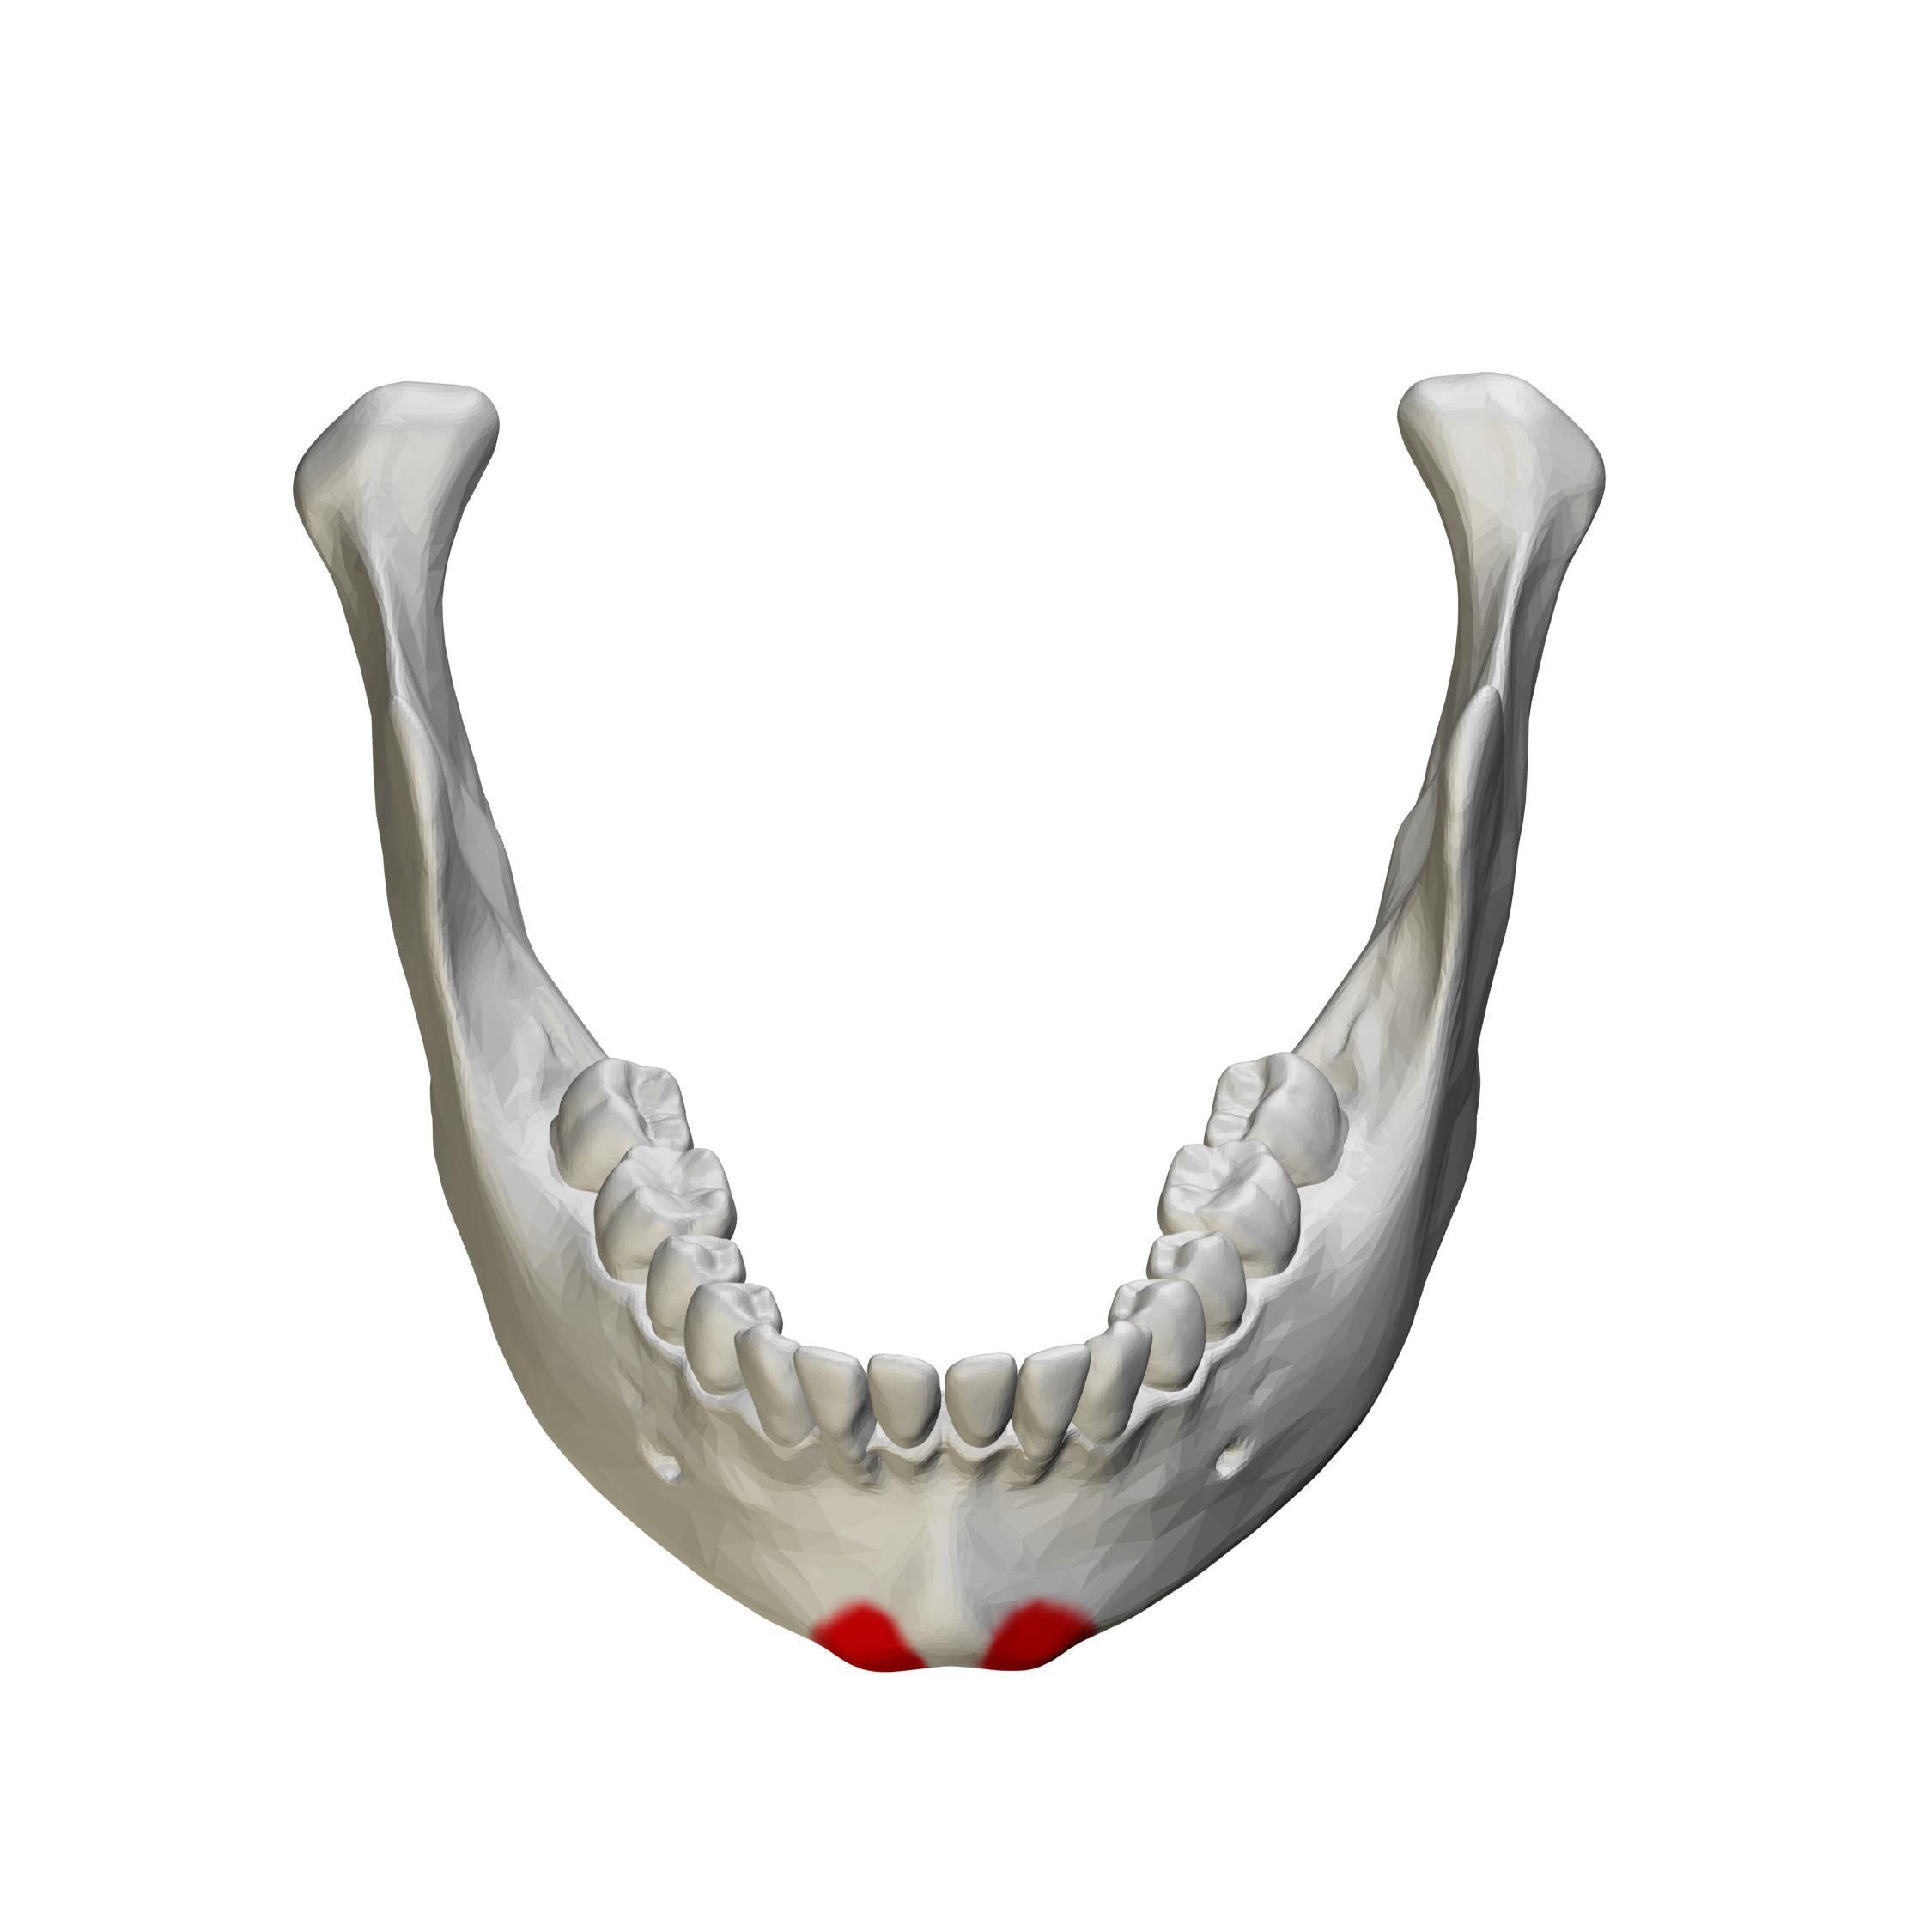 File:Mental tubercle - close up - anterior view02.png ...